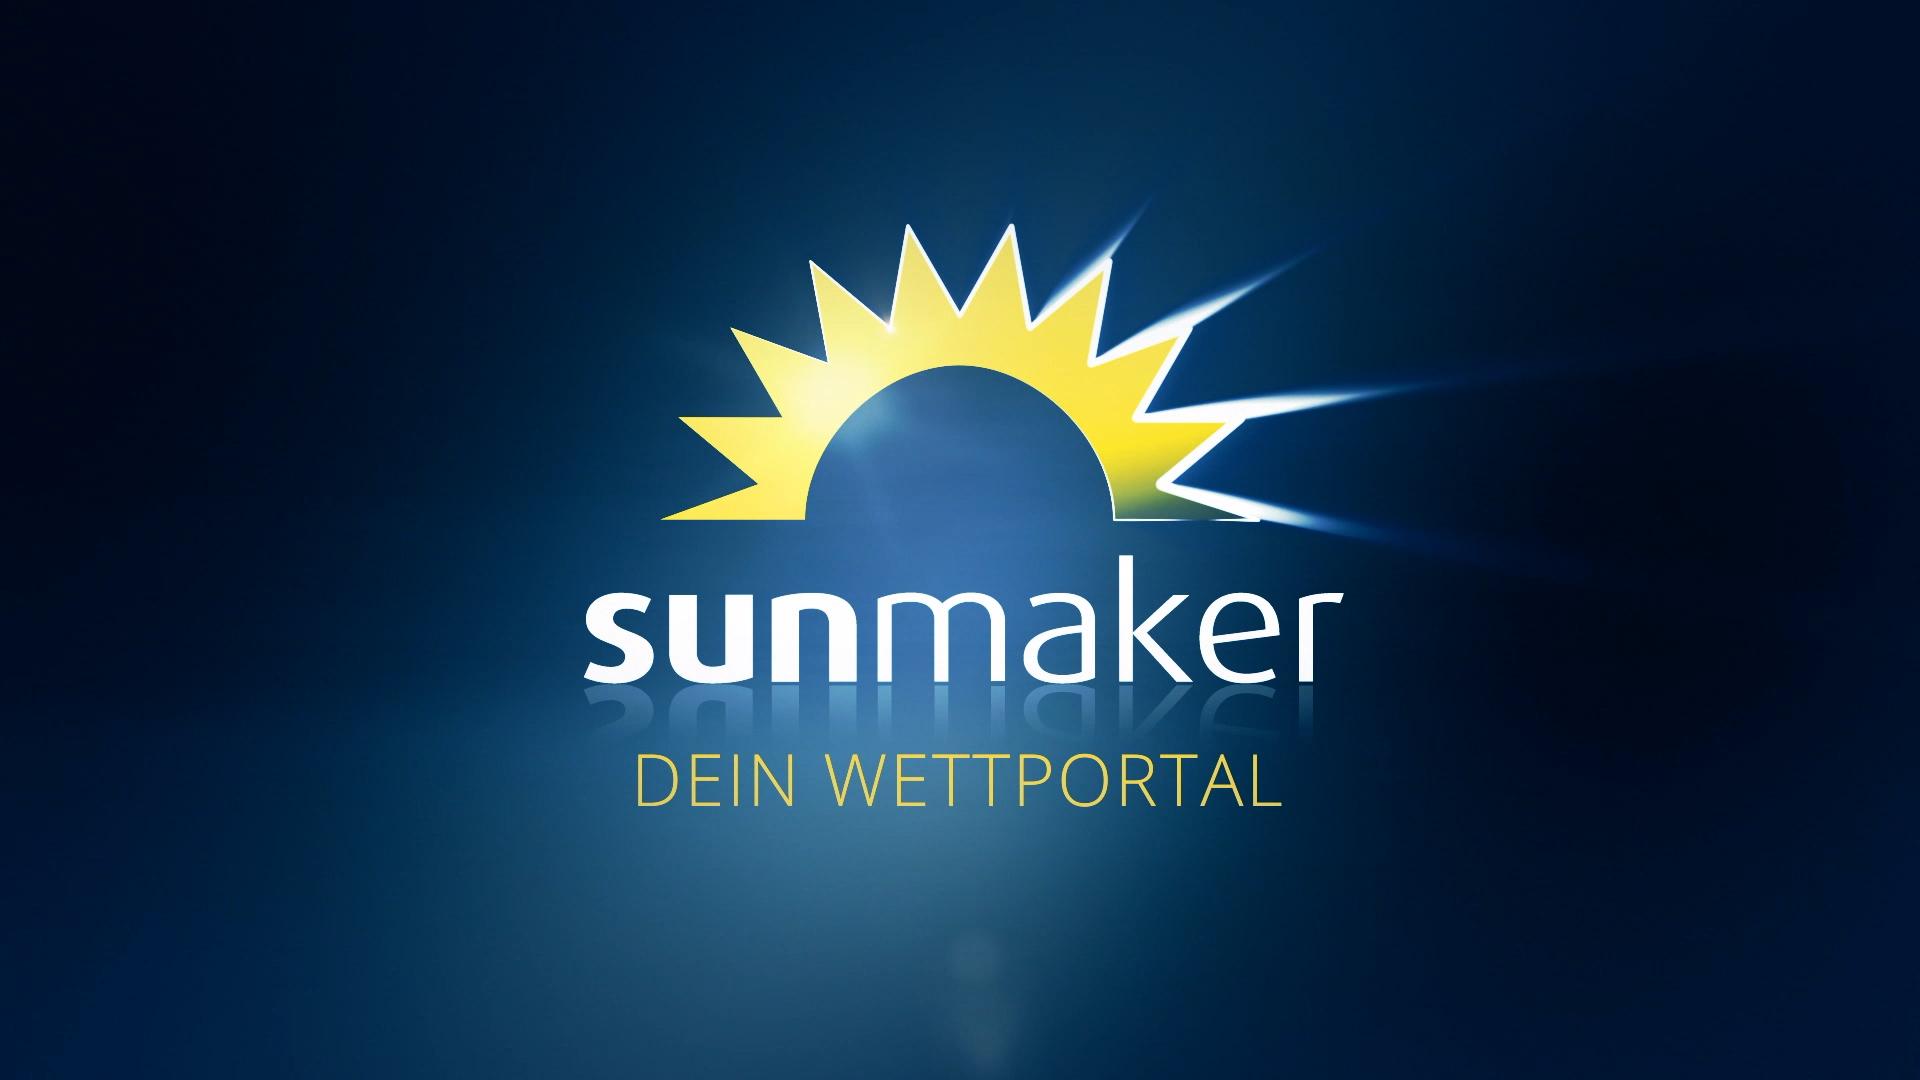 sunmaker TV-Spot Wetten